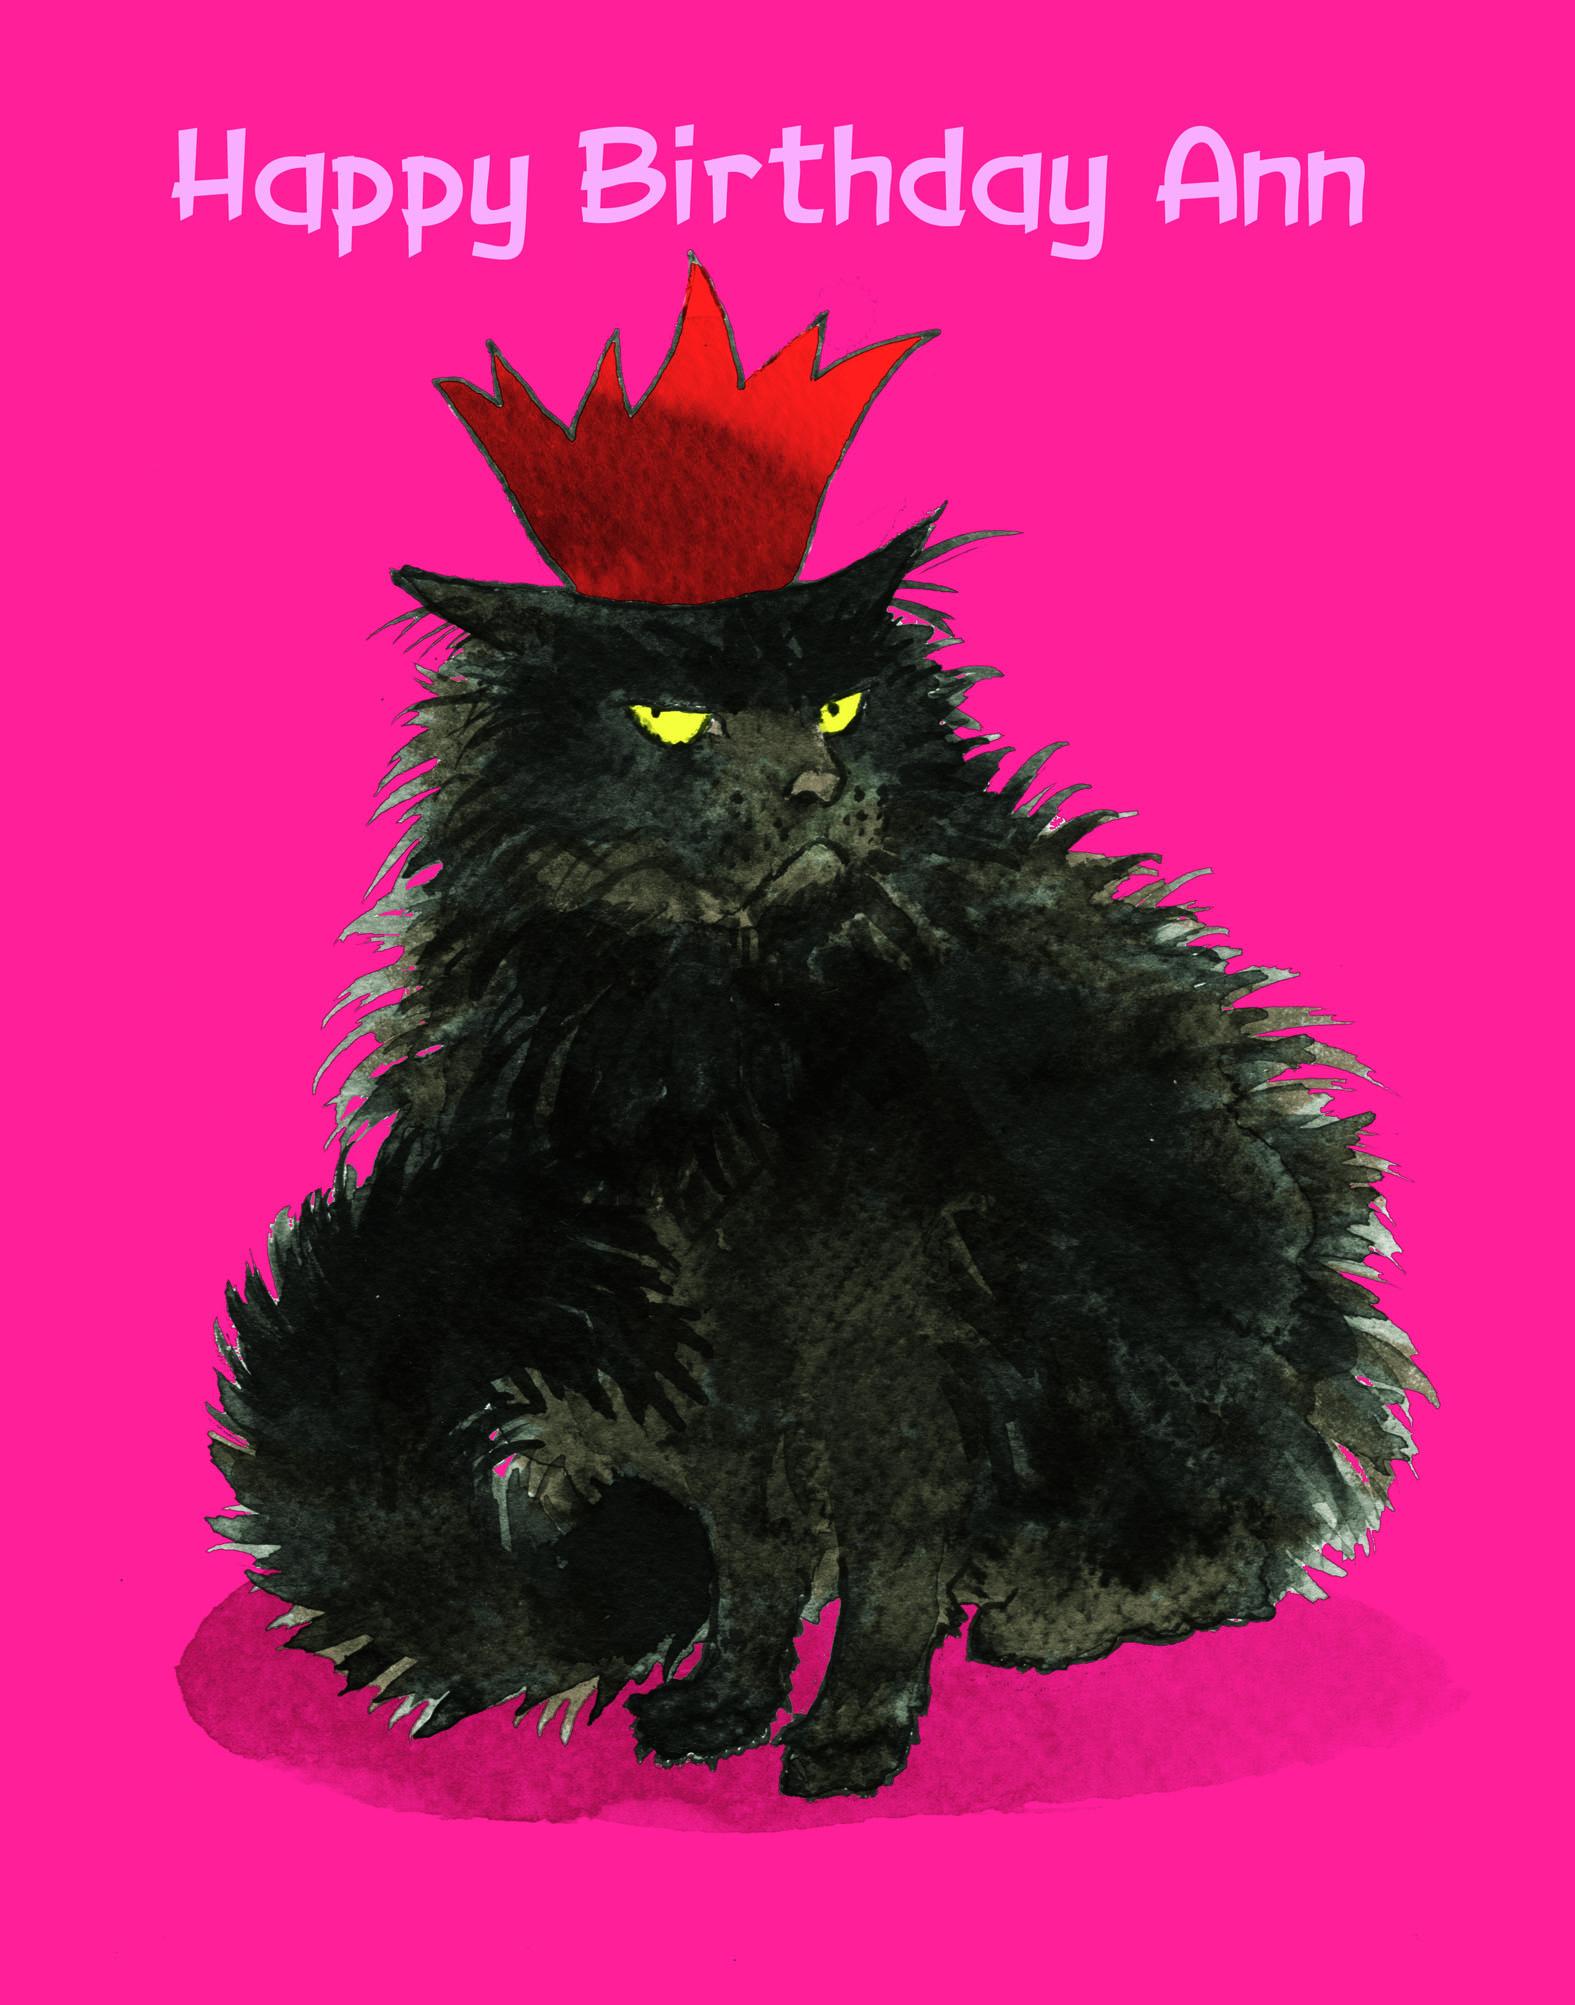 Sam says happy birthday Ann James lores